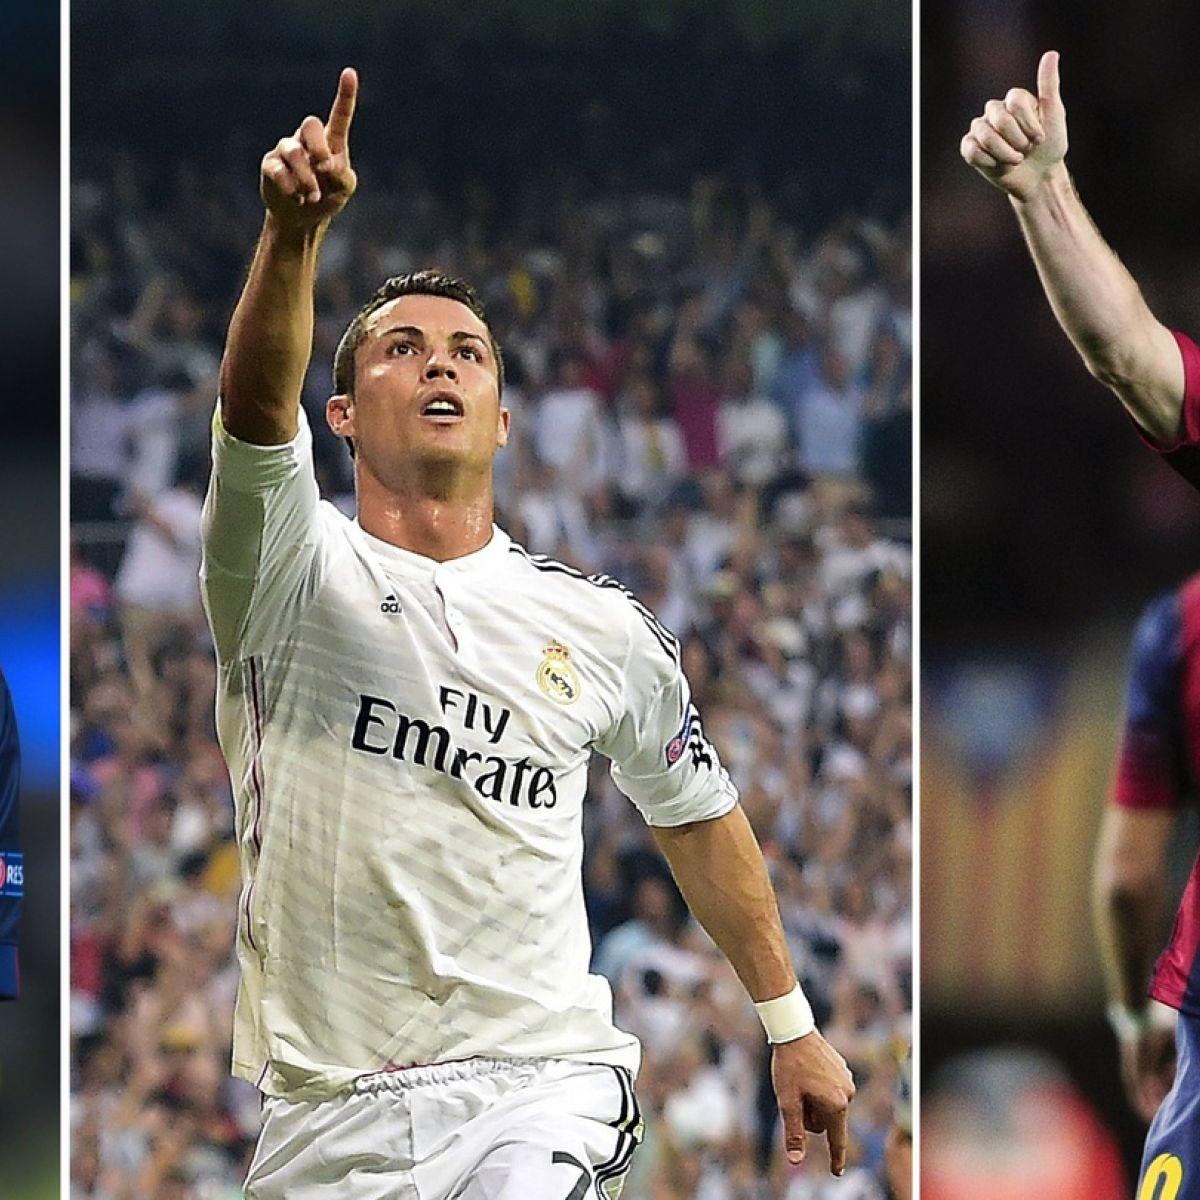 Neymar joins Lionel Messi and Cristiano Ronaldo in Ballon d